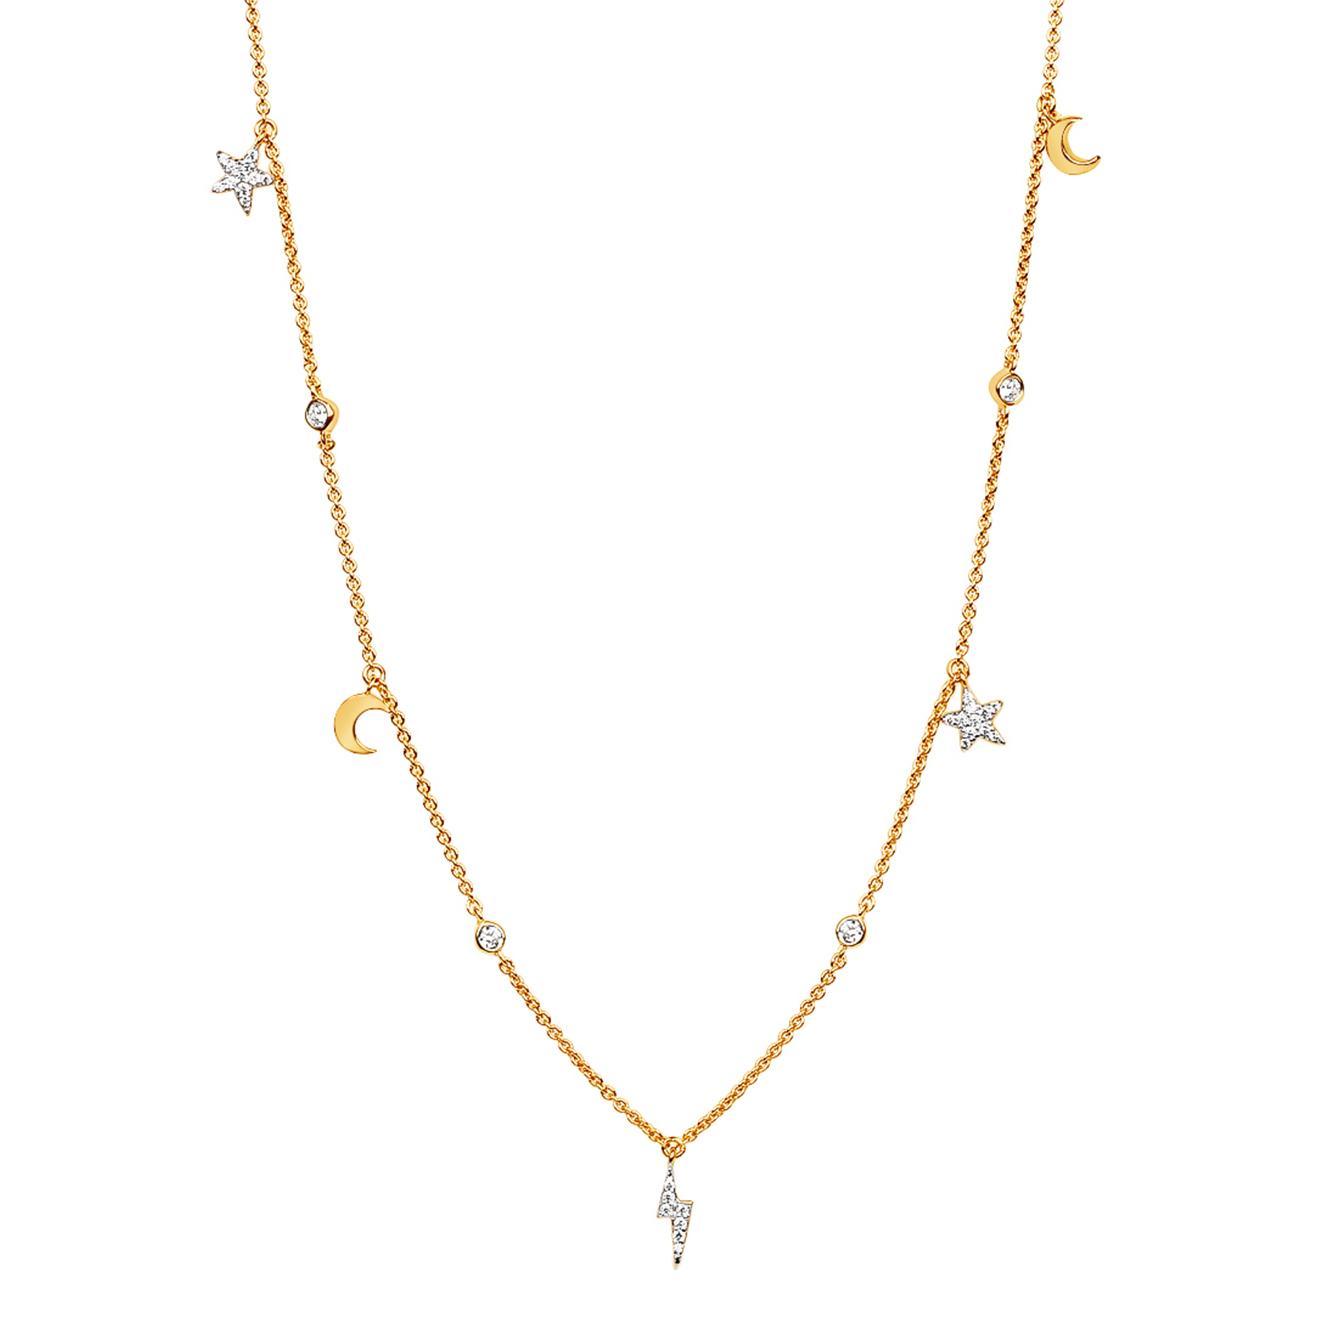 LAV'Z Позолоченное колье Universe Necklace, из коллекции Universe pantone universe сандалии